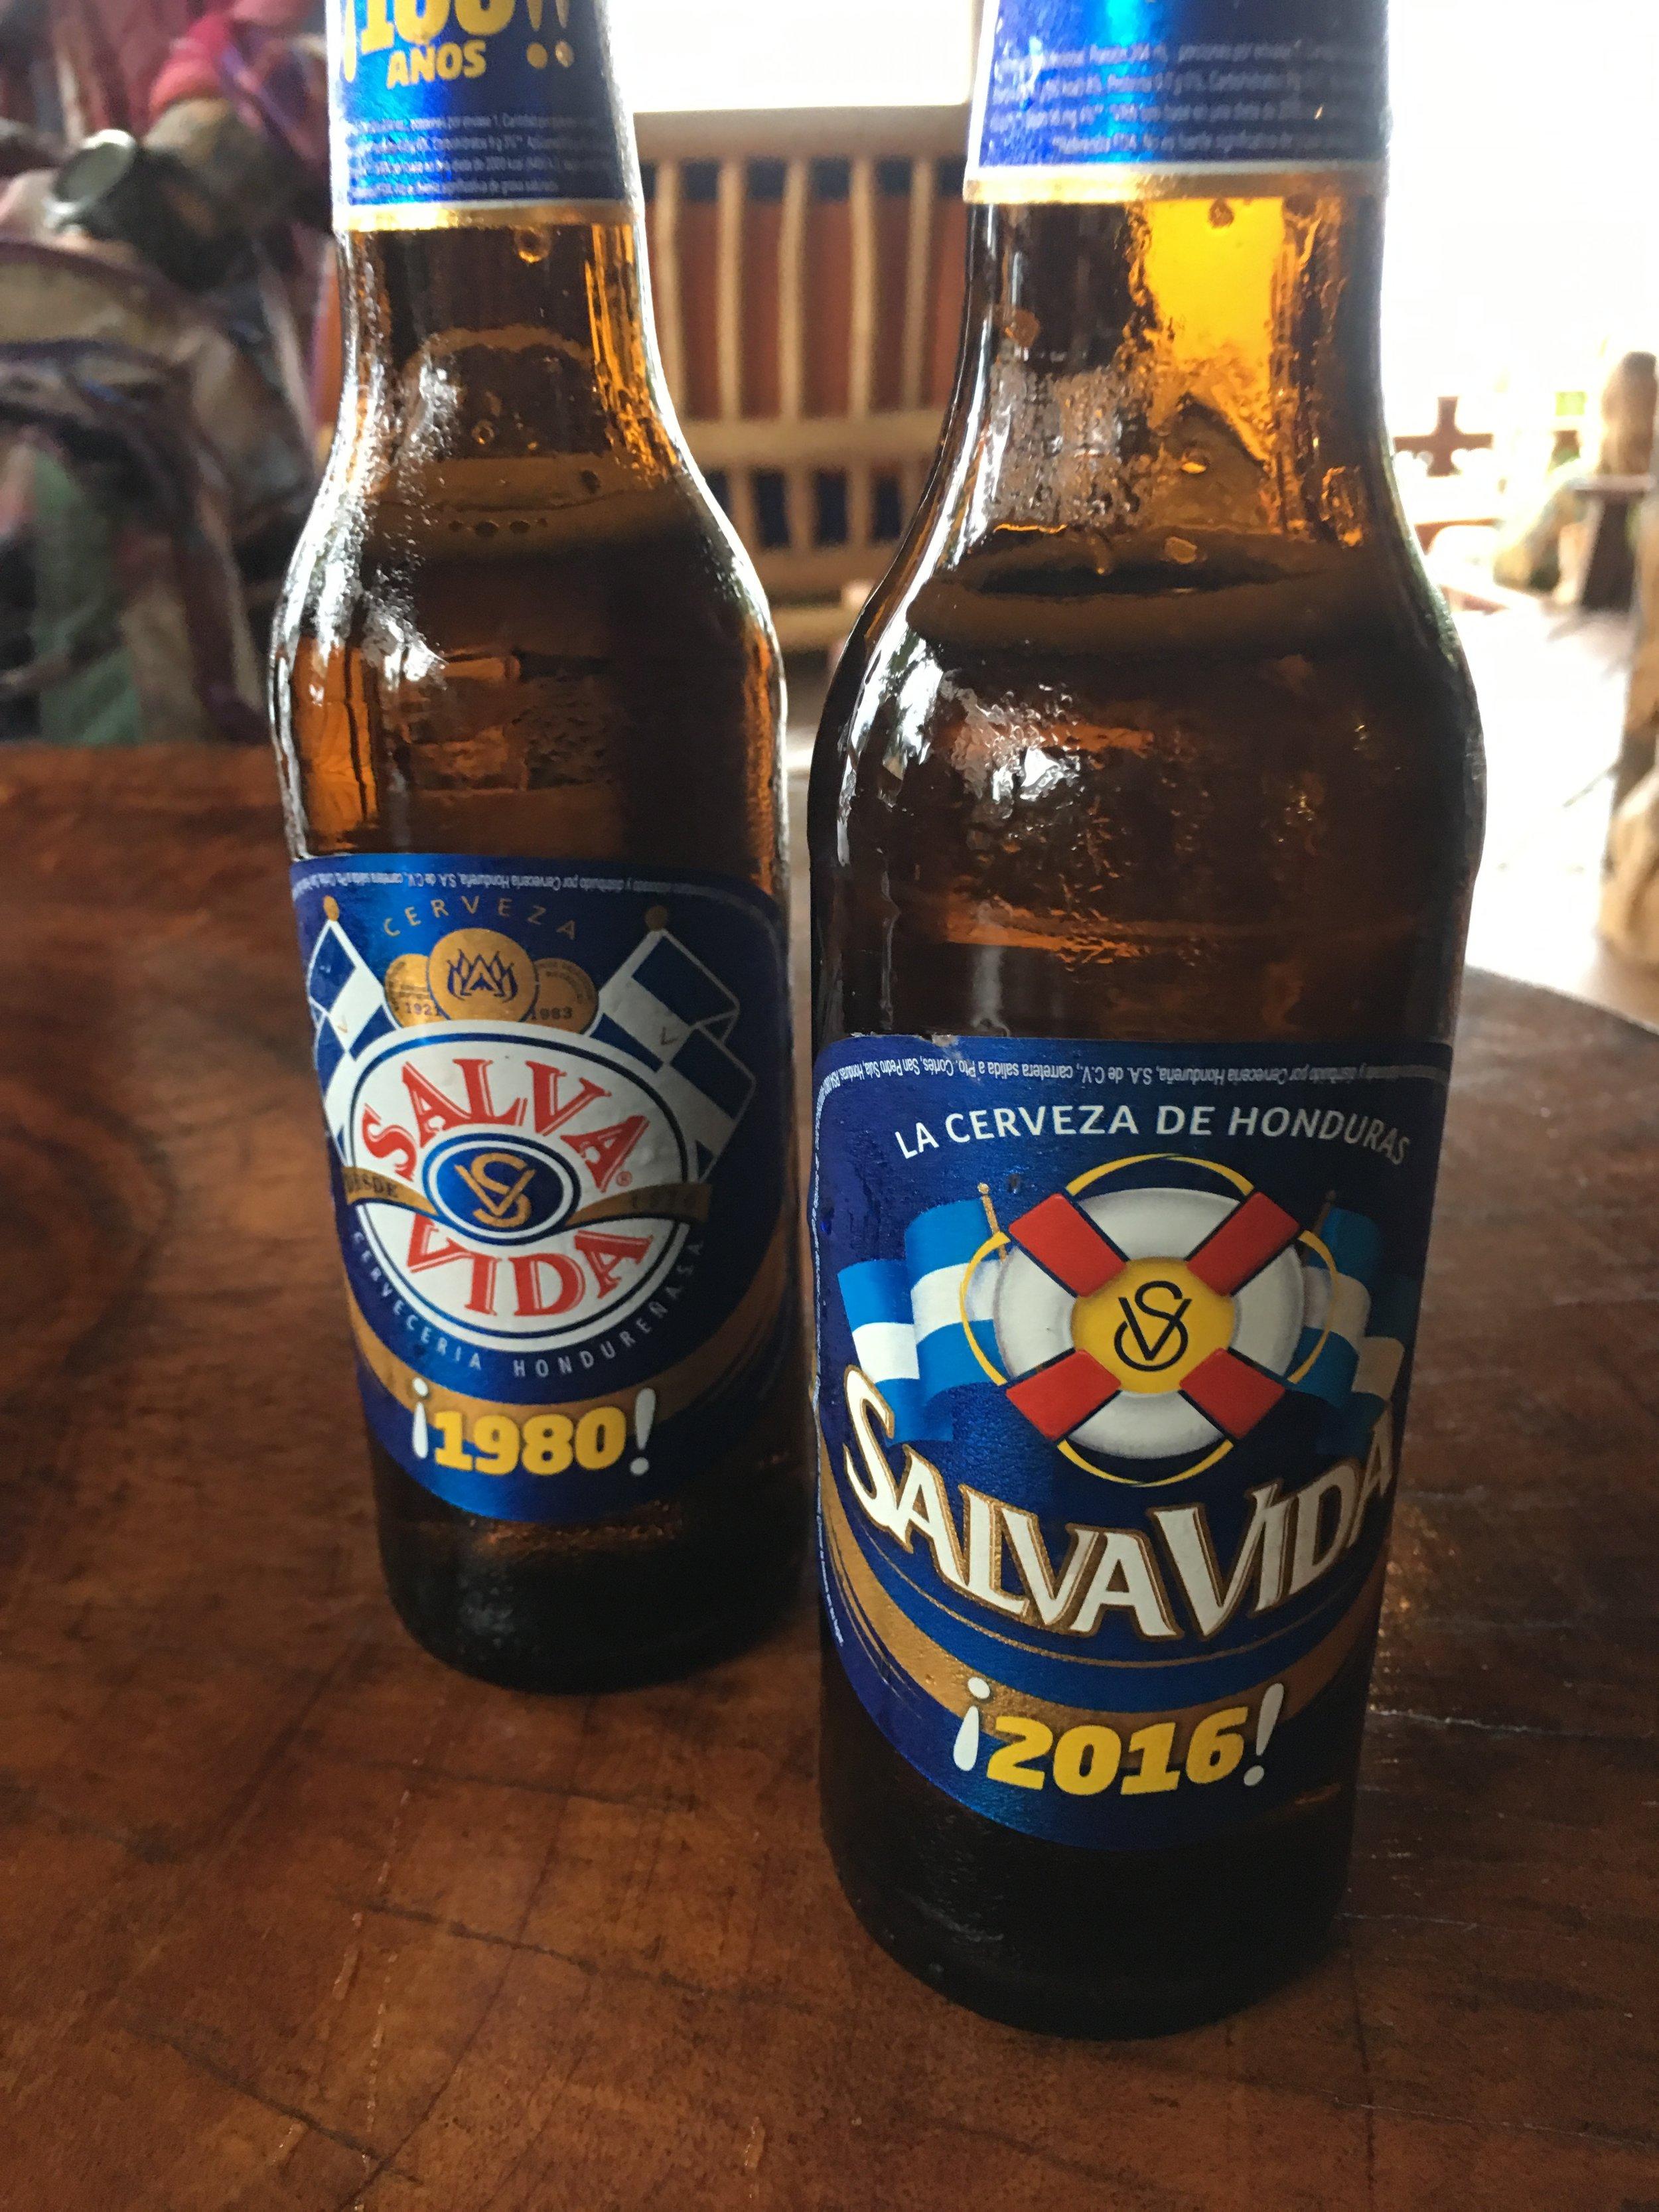 Salva Vida bottles with the anniversary labels